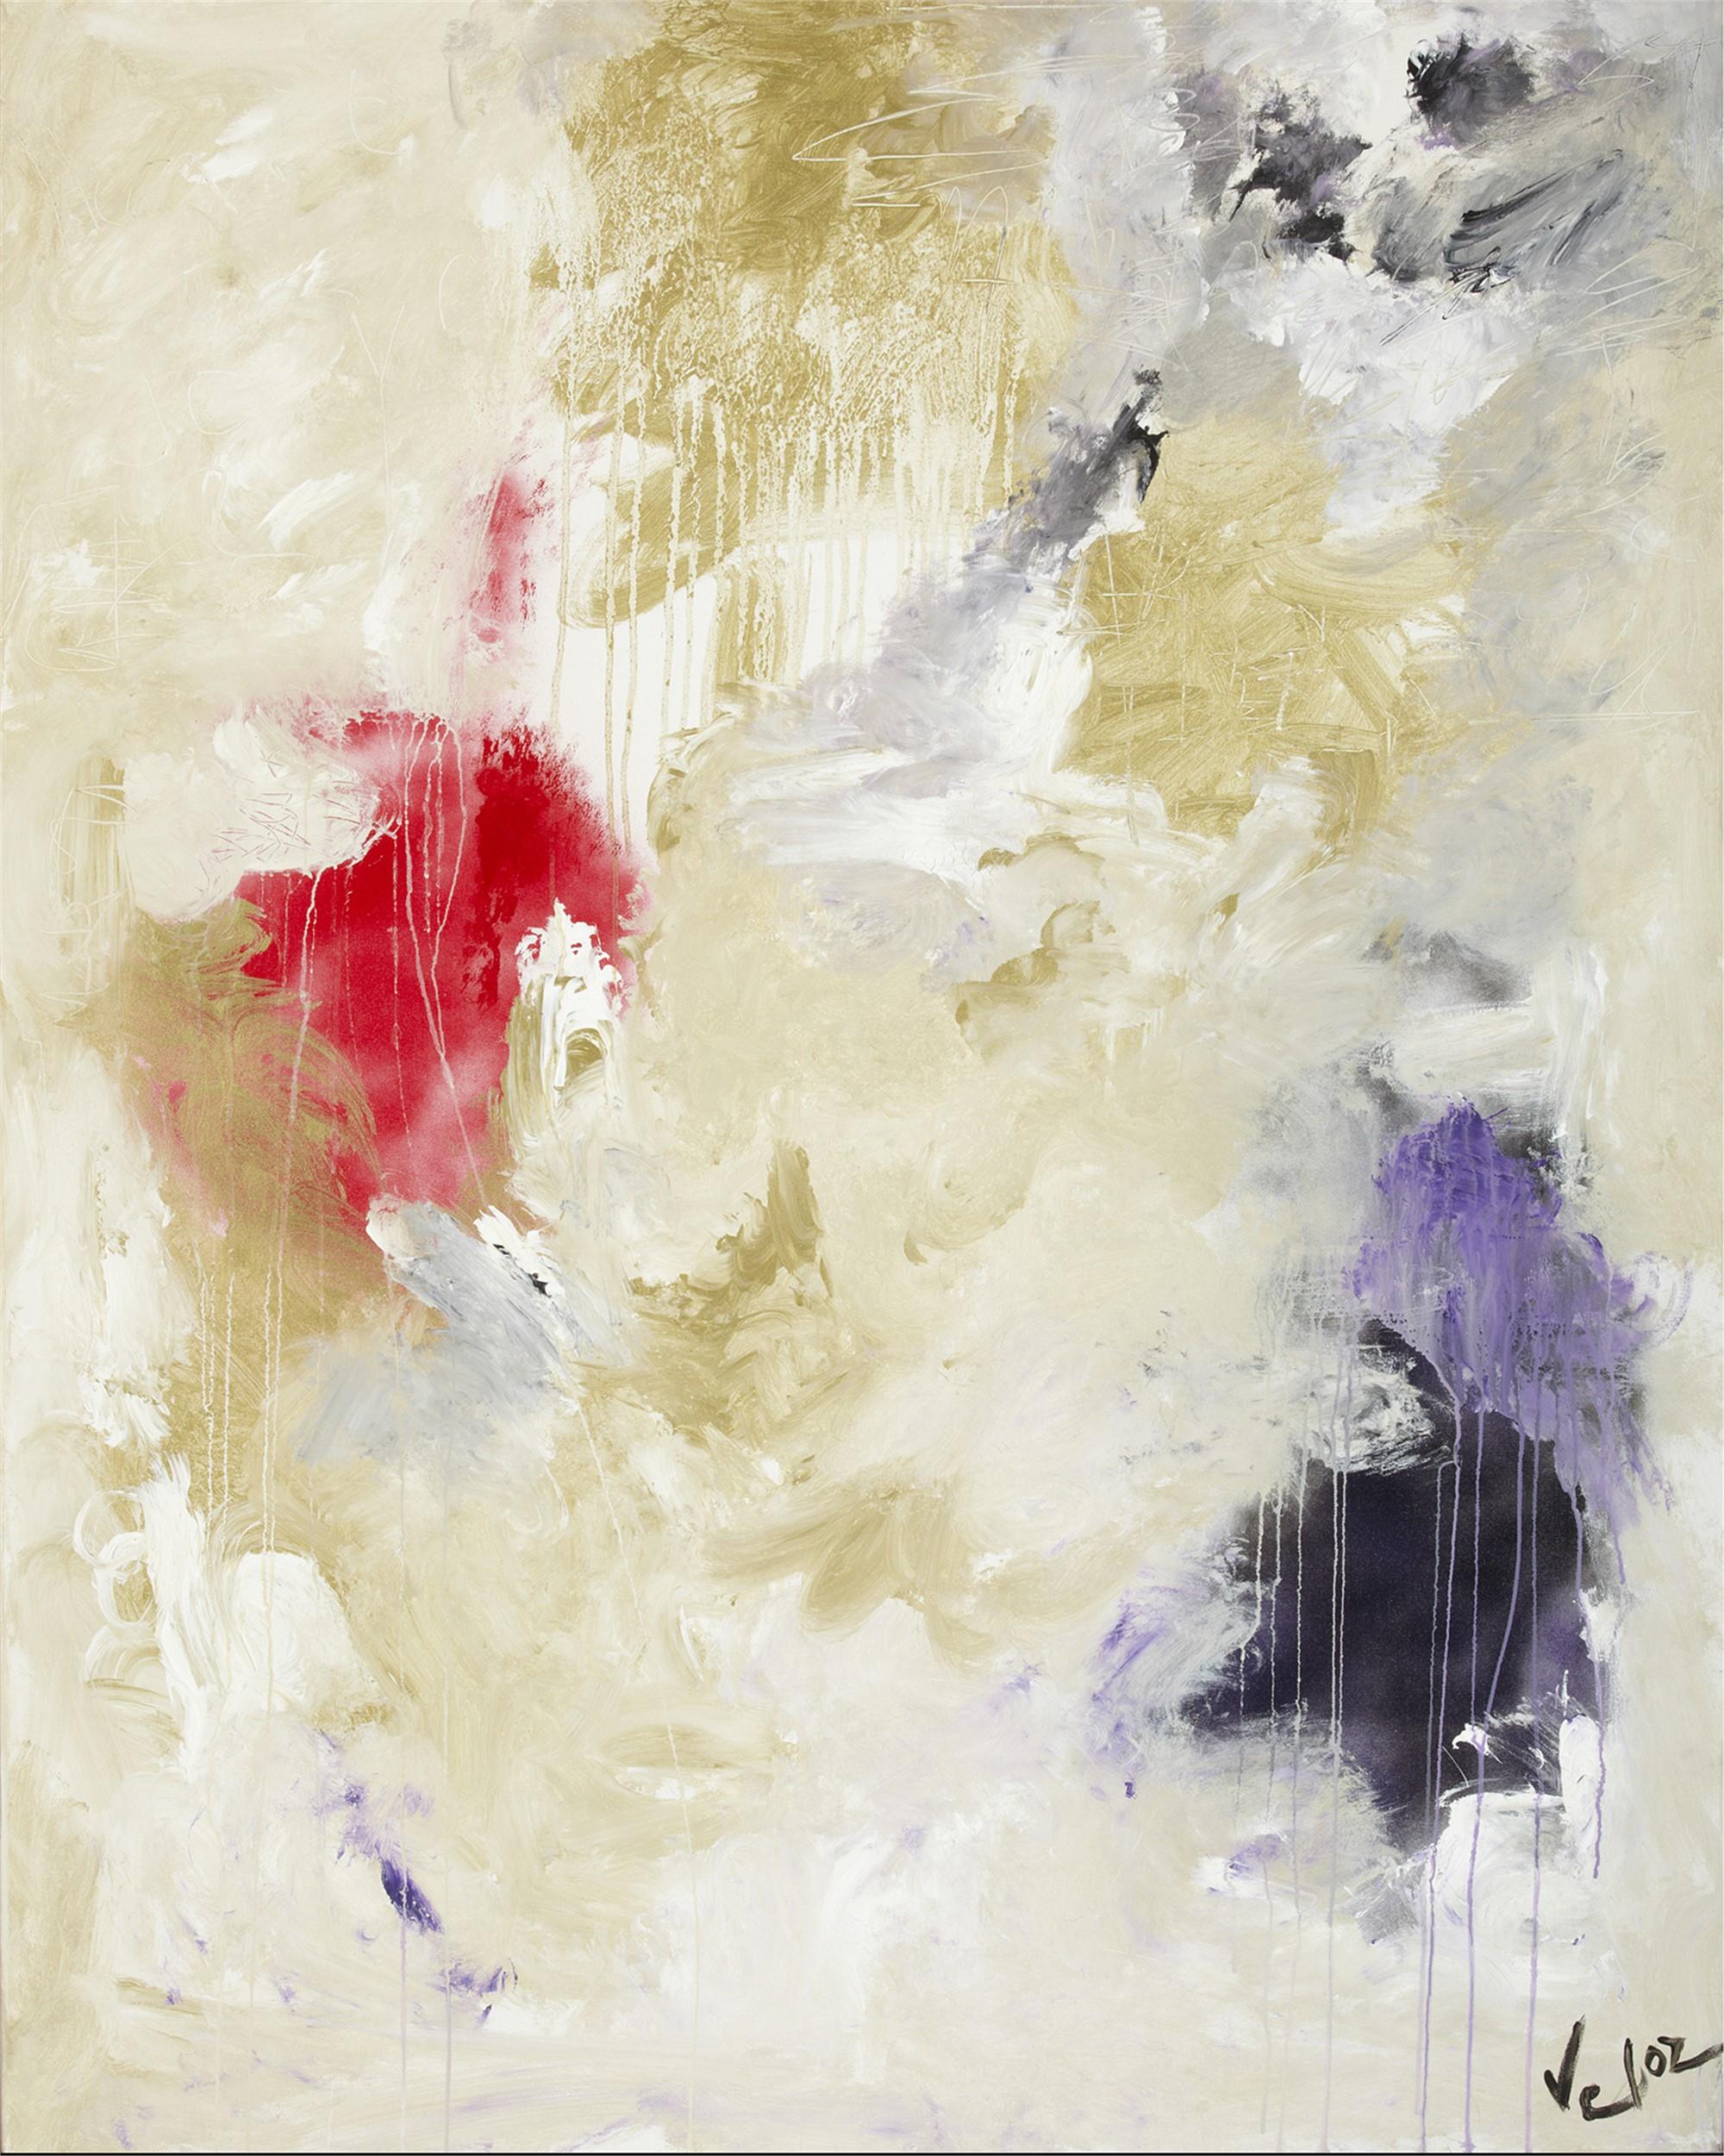 Divine Love: The Innocent Heart by Ana Luisa Veloz